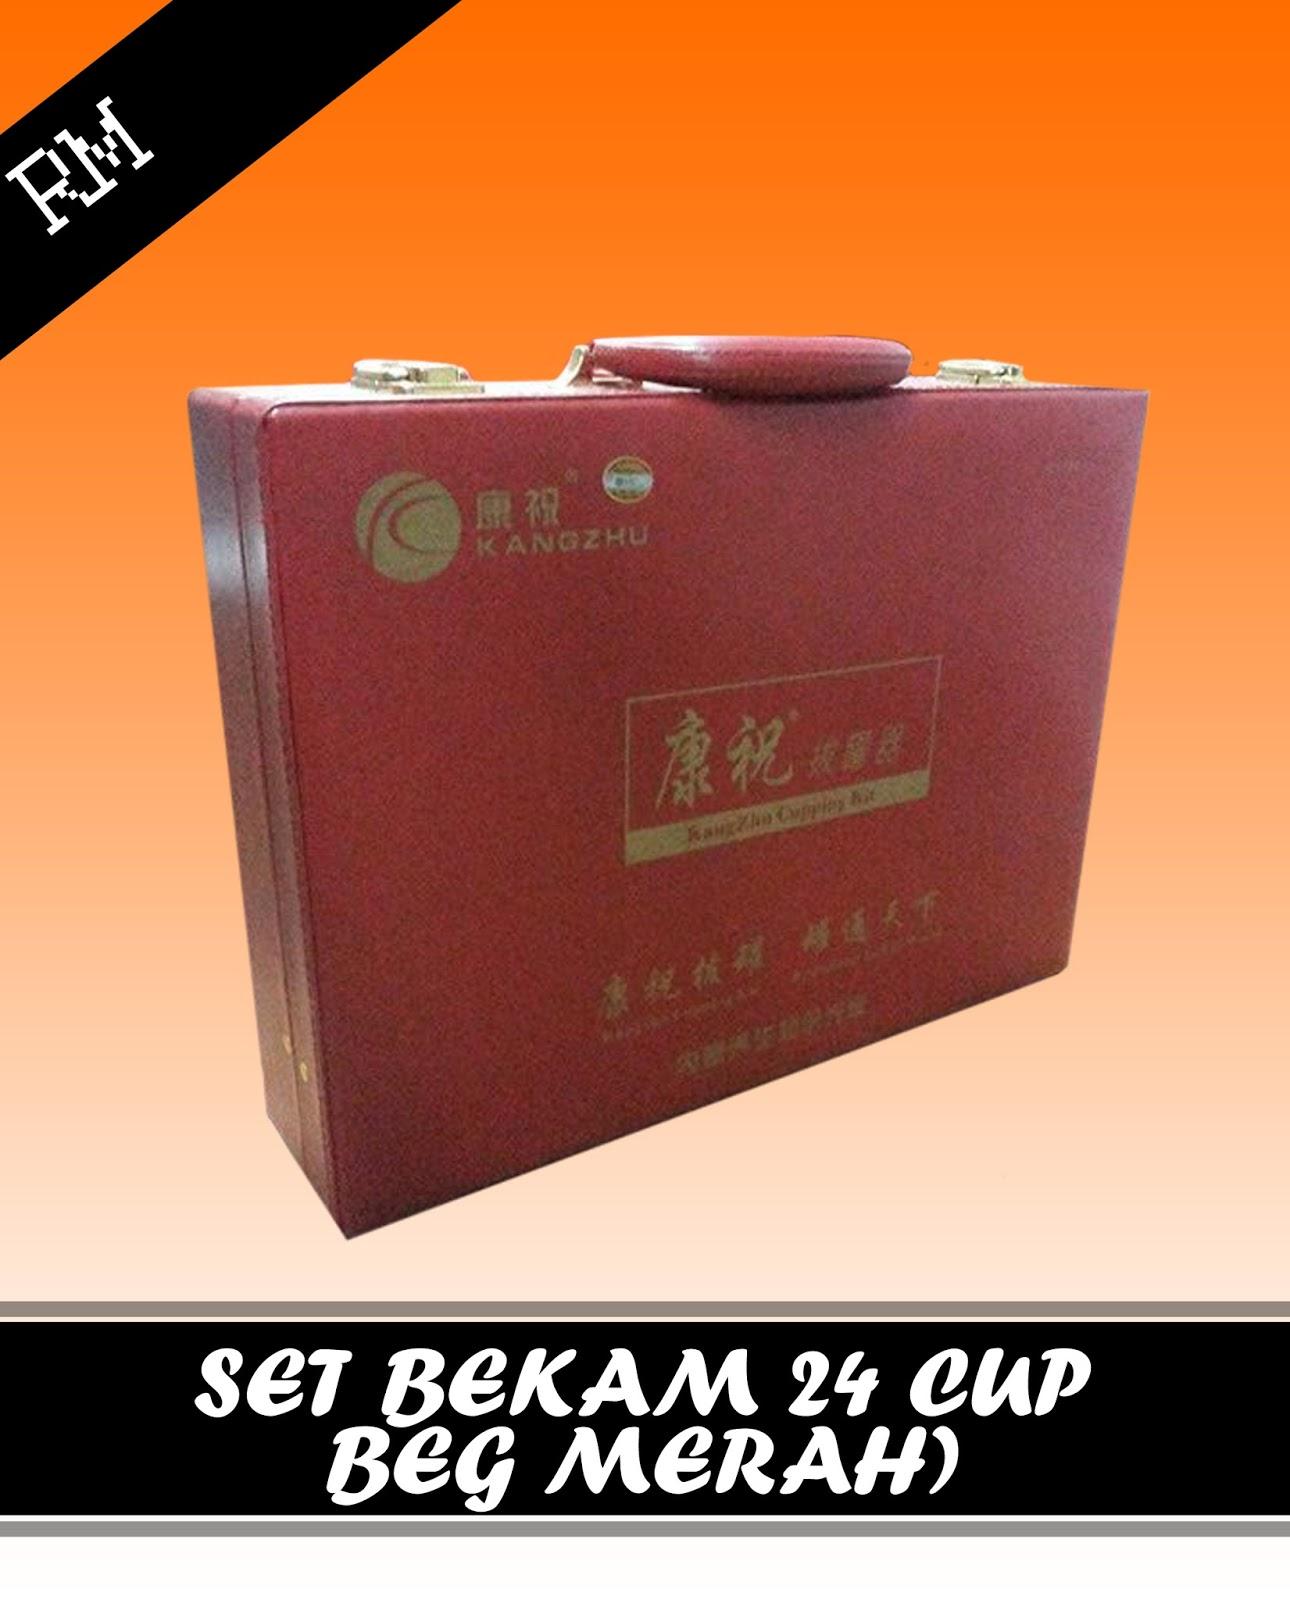 One Stop Muslim Shop Kangzhu Kop Kang Zhu 12 Set Bekam Cup